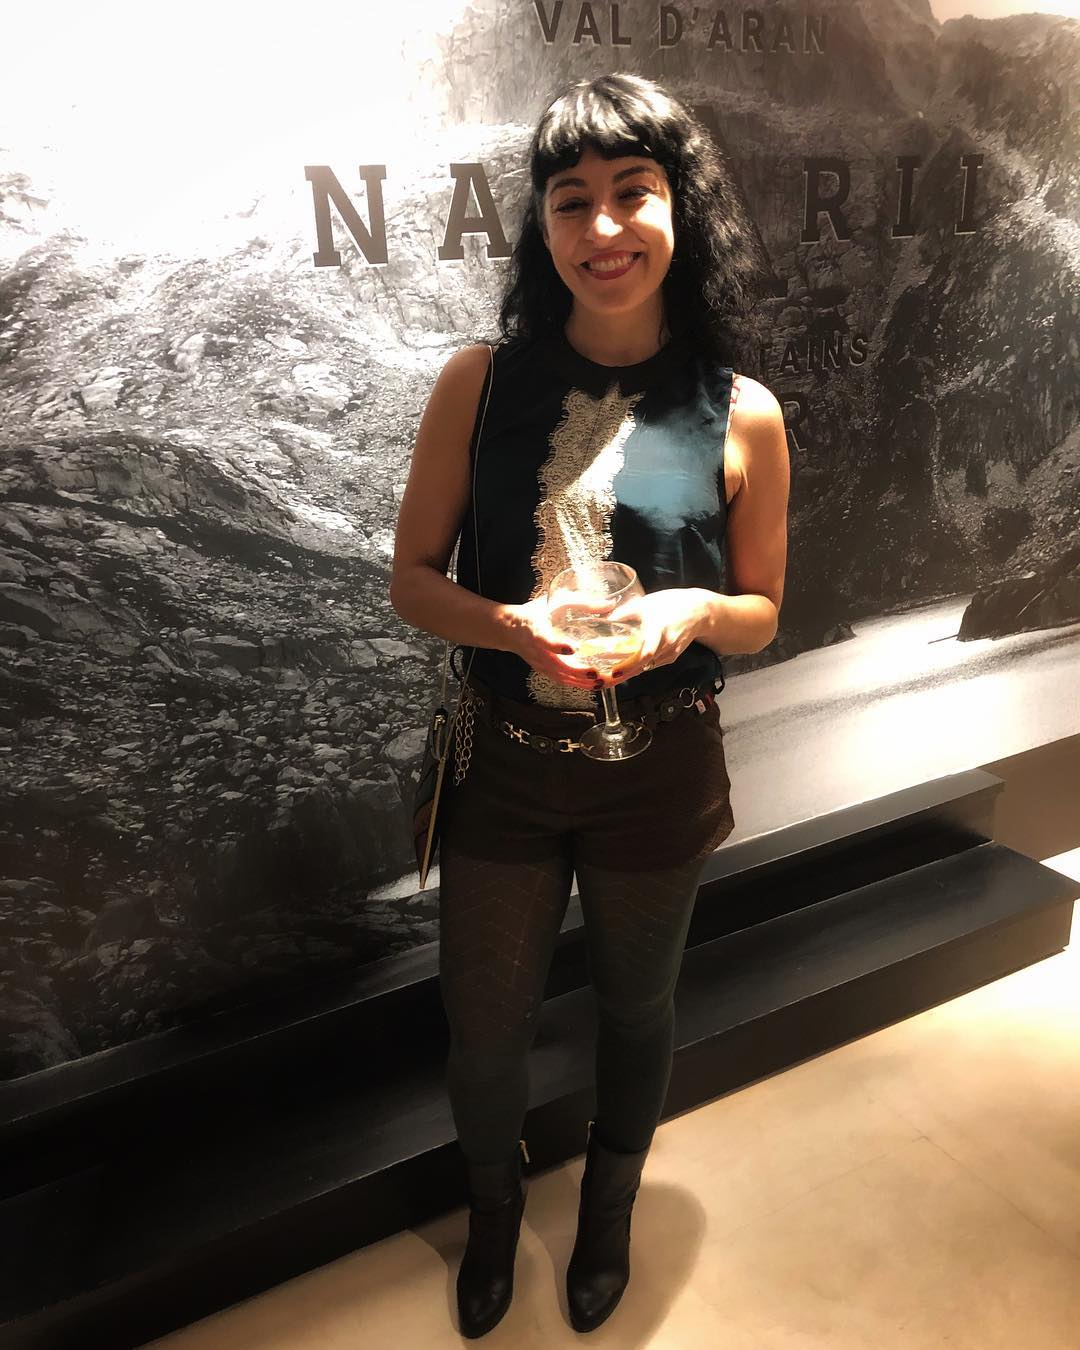 Celebramos el 1er aniversario boutique experiencia caviar Nacarii Vall d'Aran #caviar #nacarii #bcn #barcelona #caviarnacarii #valld'aran #gourmet #experience [foto de @montsefotos3 💕]